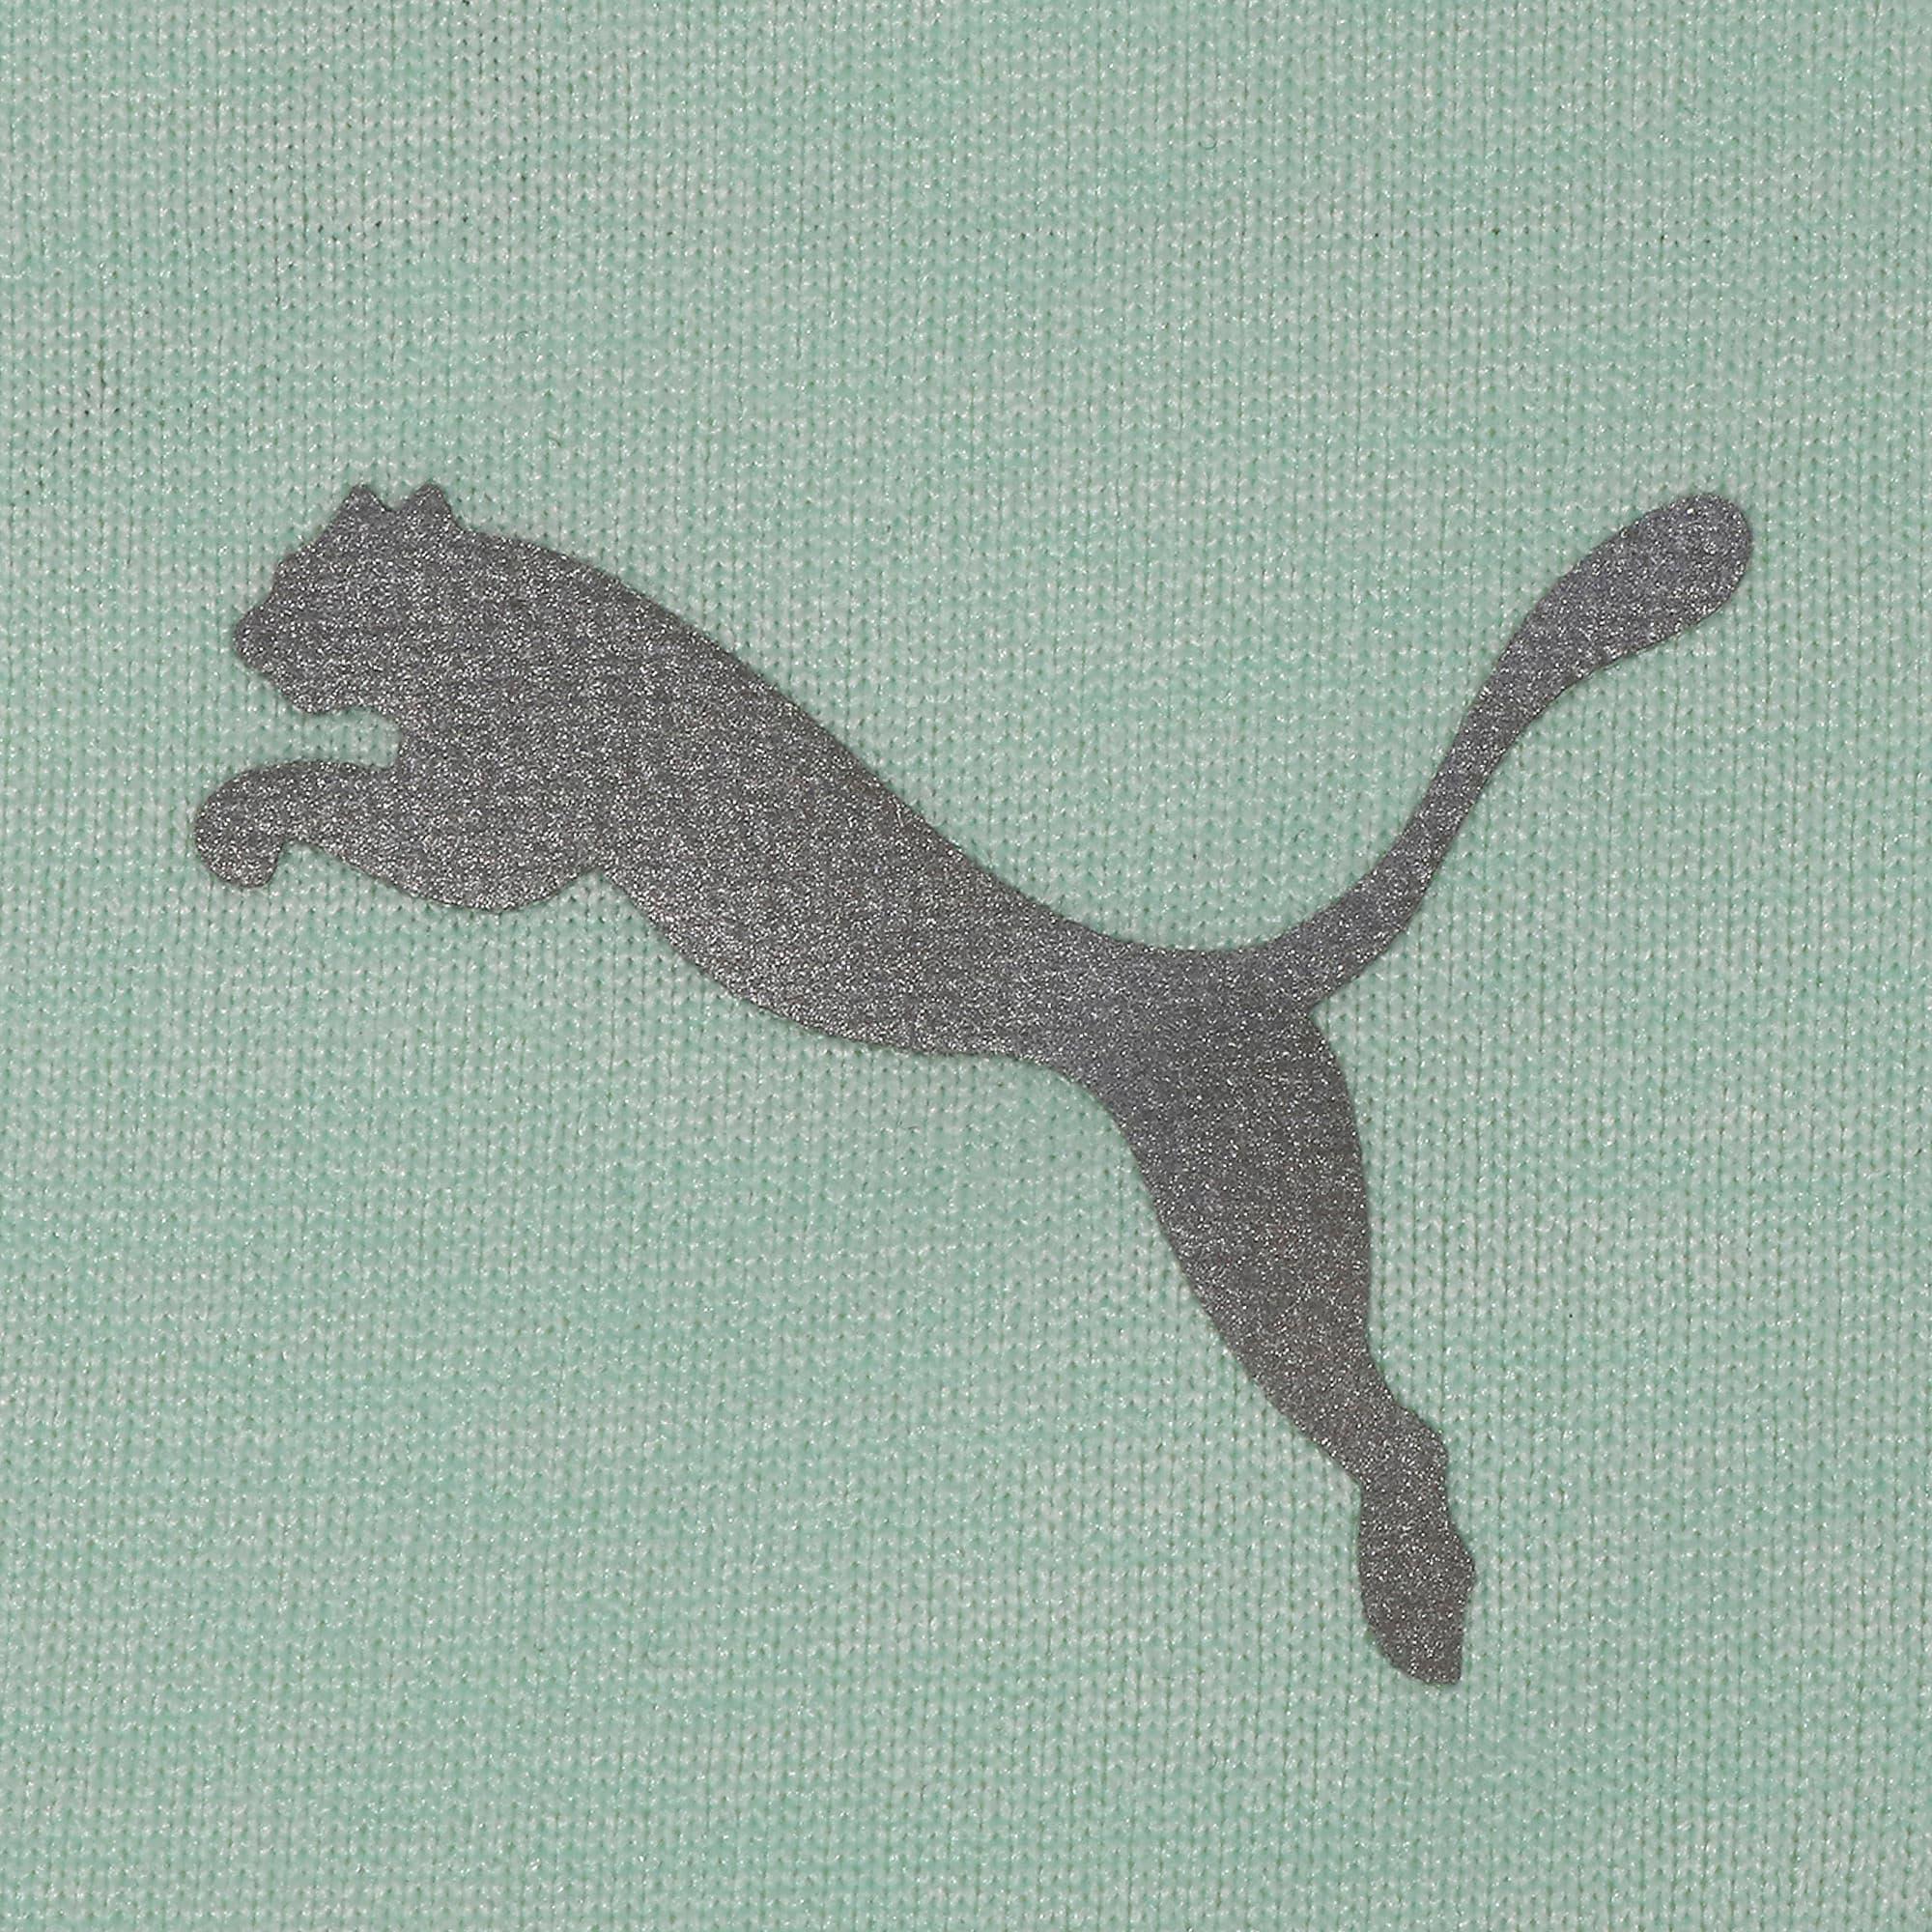 Thumbnail 3 of エピック ヘザー ウィメンズ SS Tシャツ 半袖, Fair Aqua Heather, medium-JPN